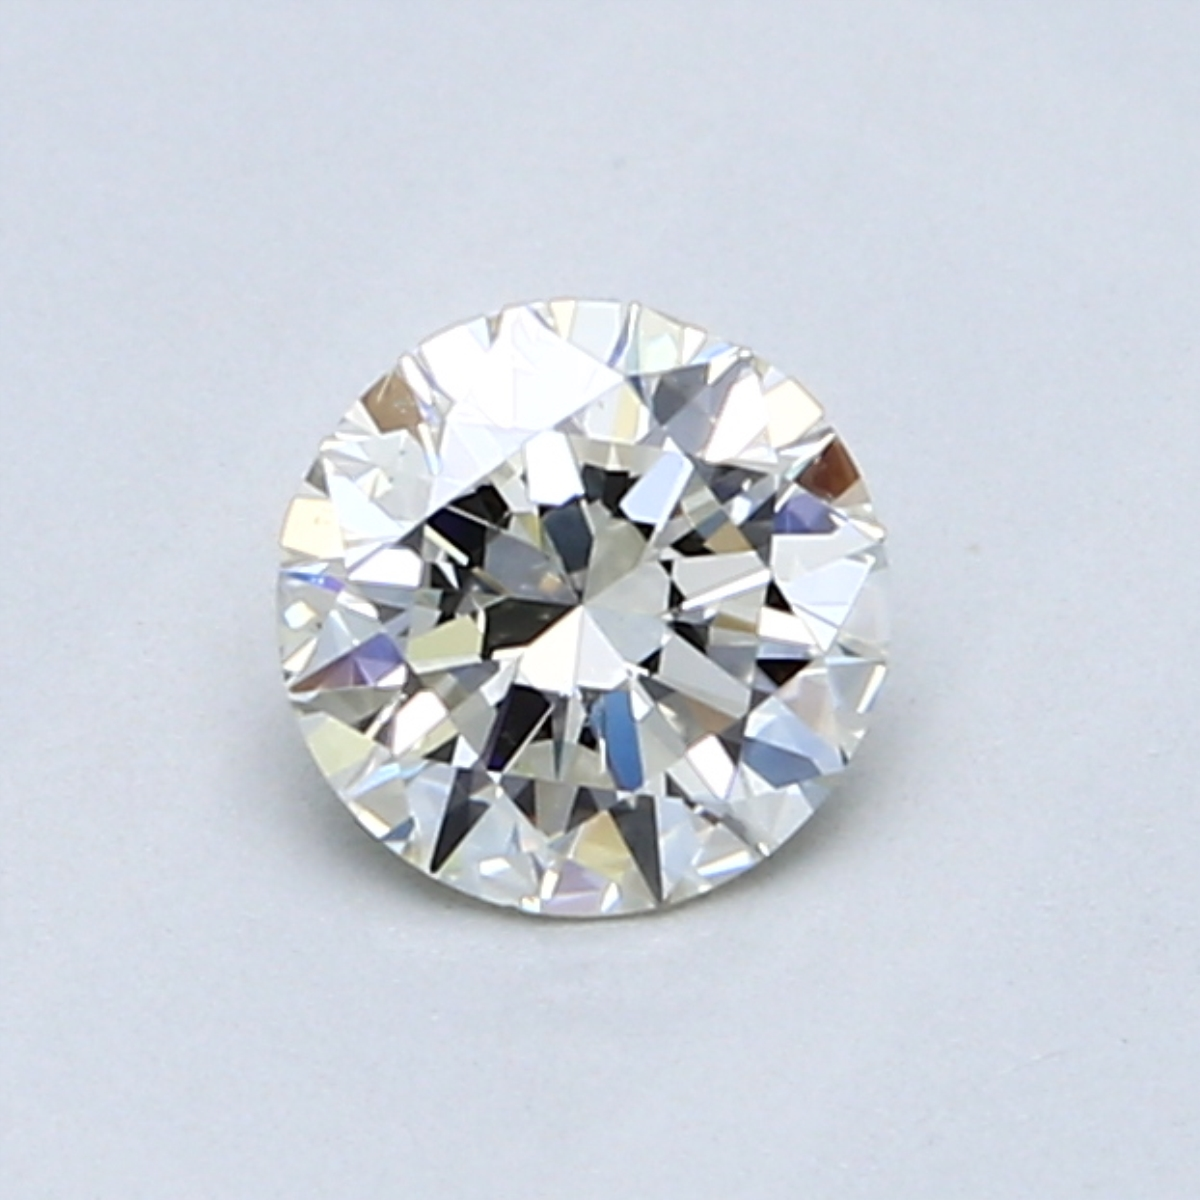 0.59 Carat K SI2 Round Diamond